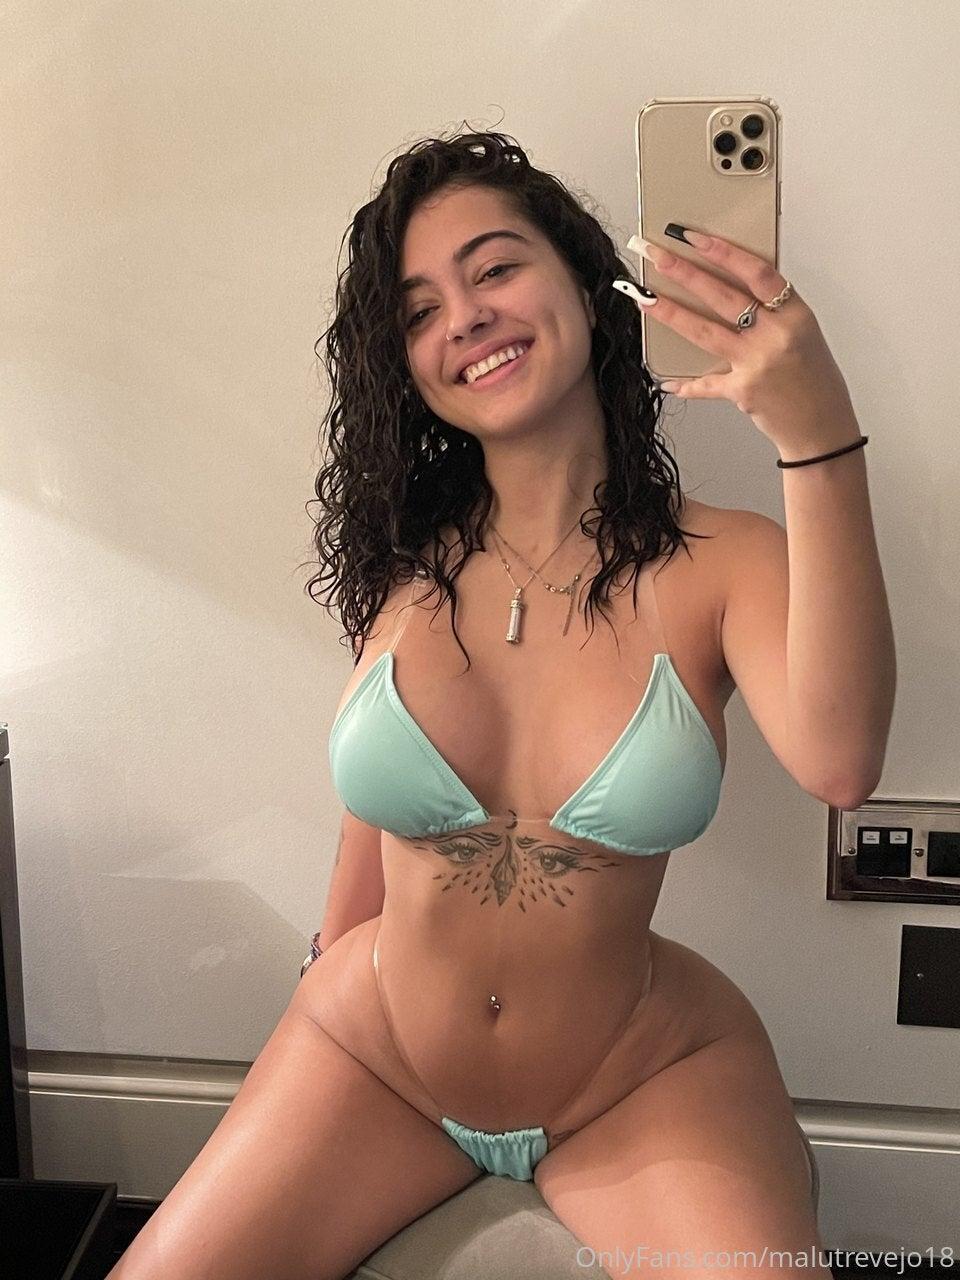 Malu Trevejo Teal Bikini Onlyfans Set Leaked Sibowb